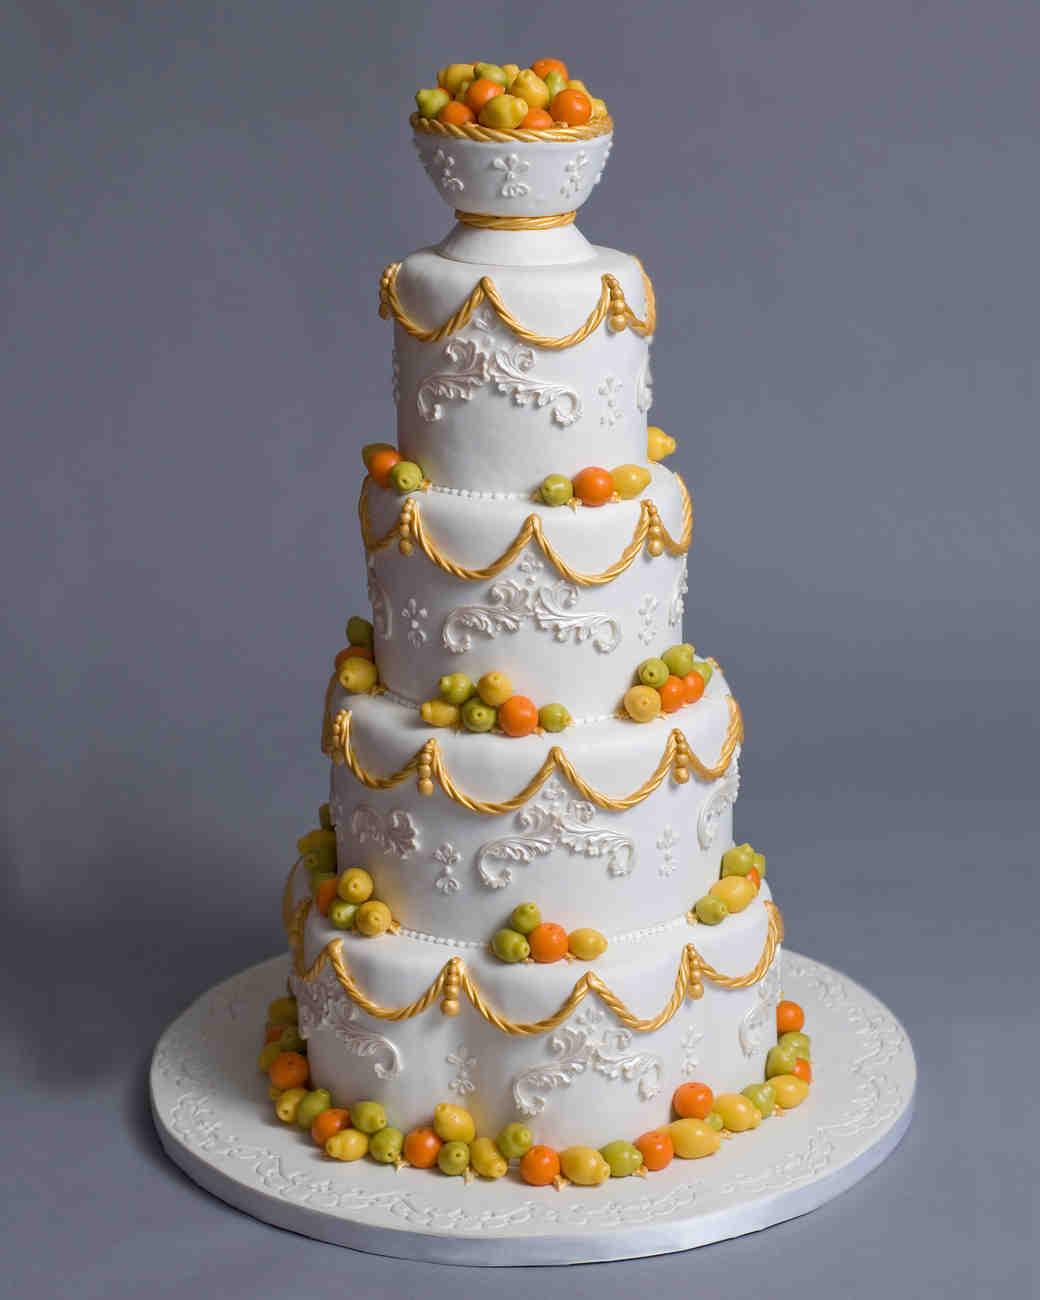 cake-pros-classiccakes-0414.jpg